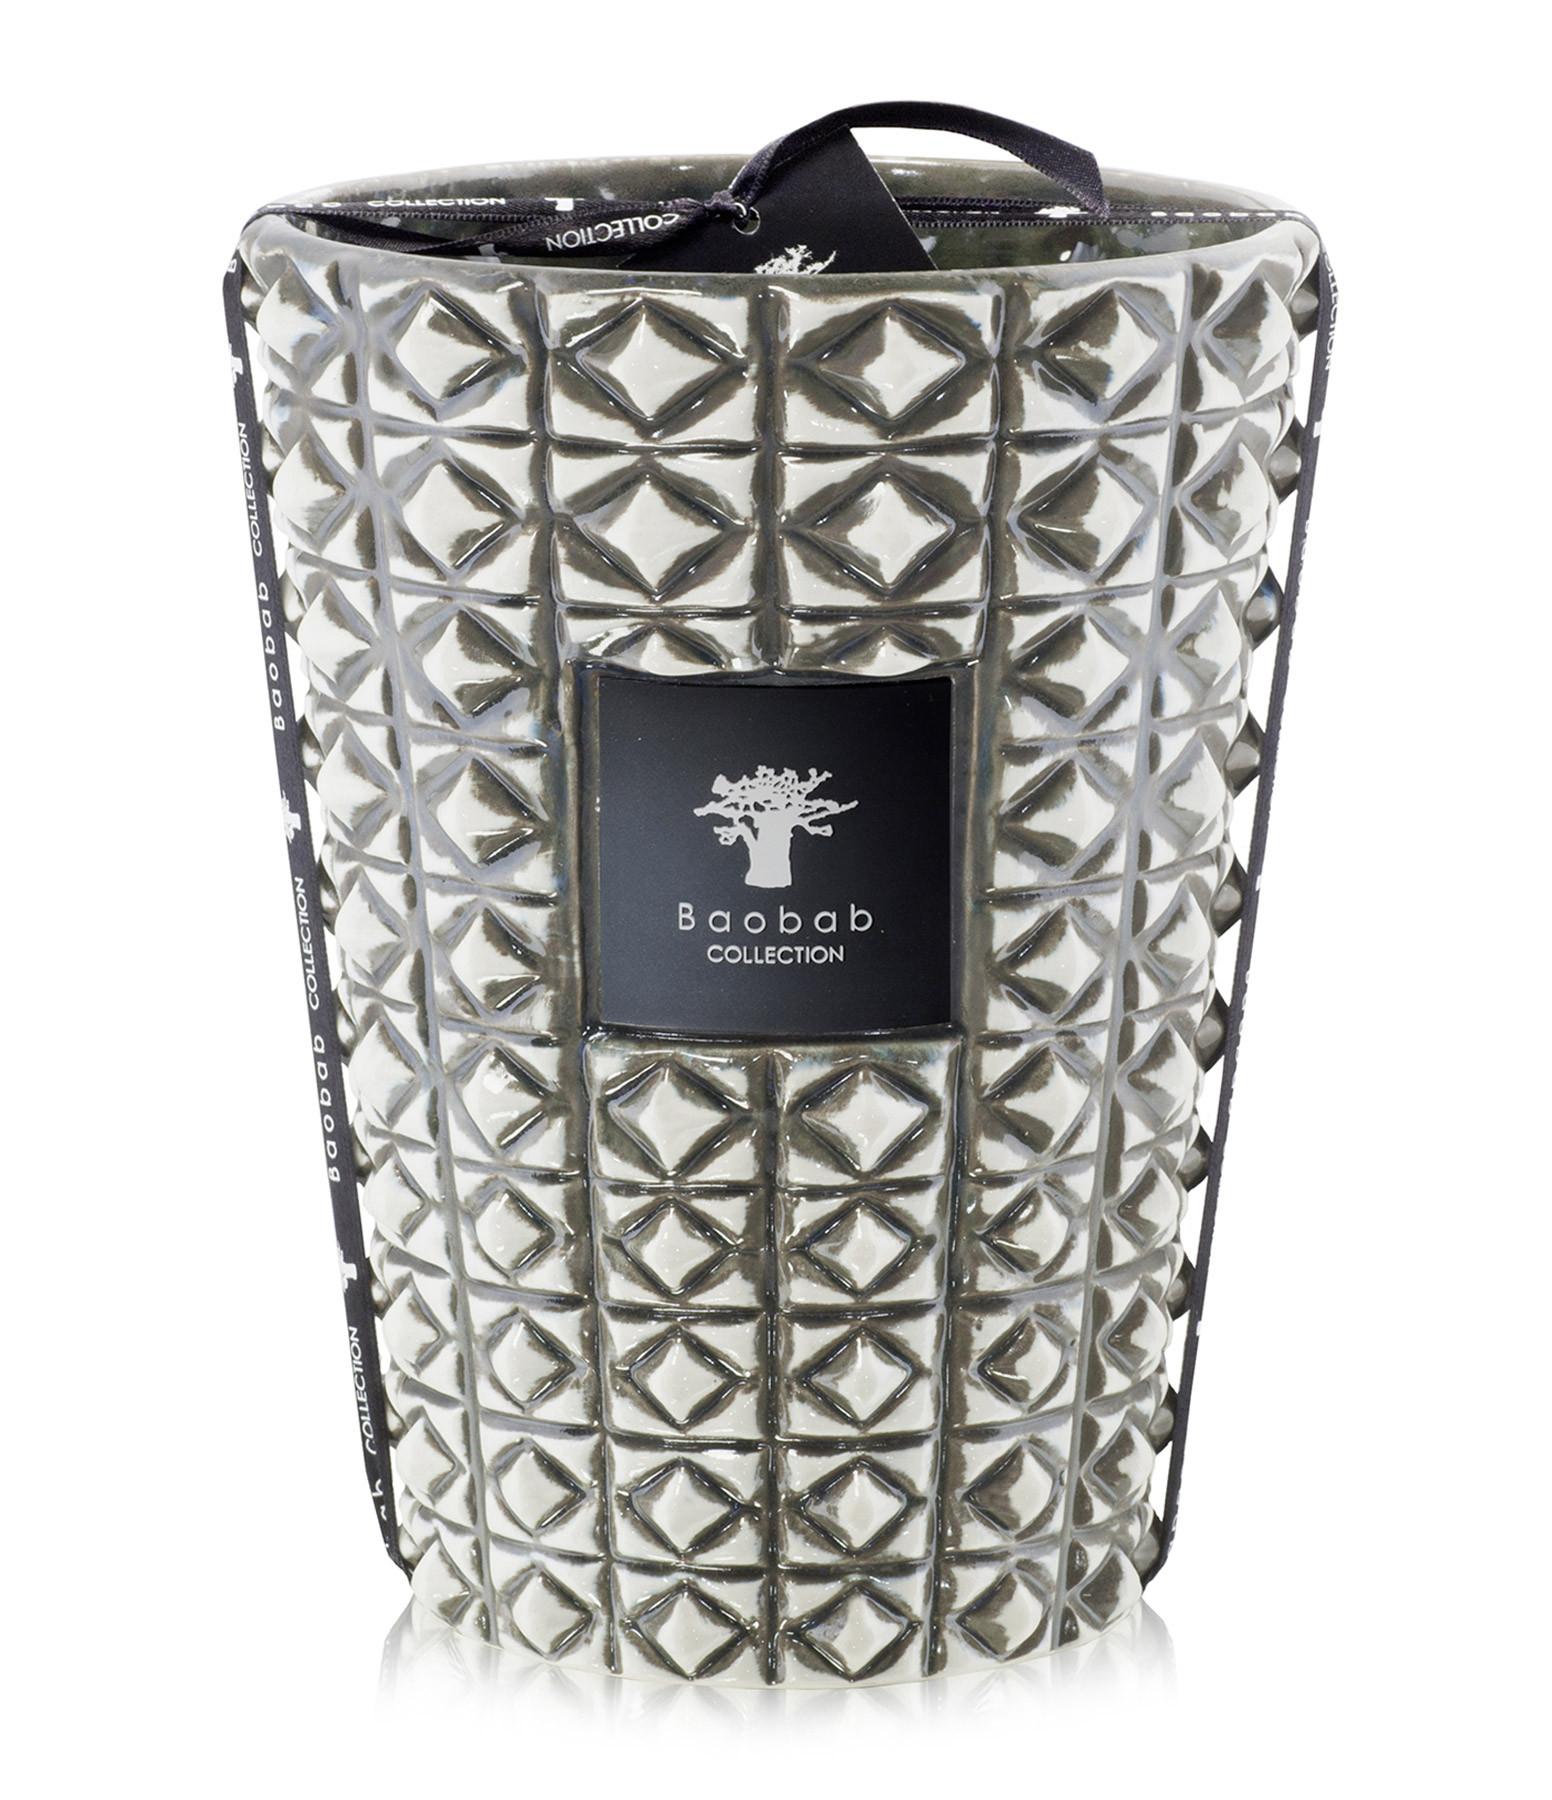 BAOBAB COLLECTION - Bougie Max 24 Modernista Ceramica Terra Negra